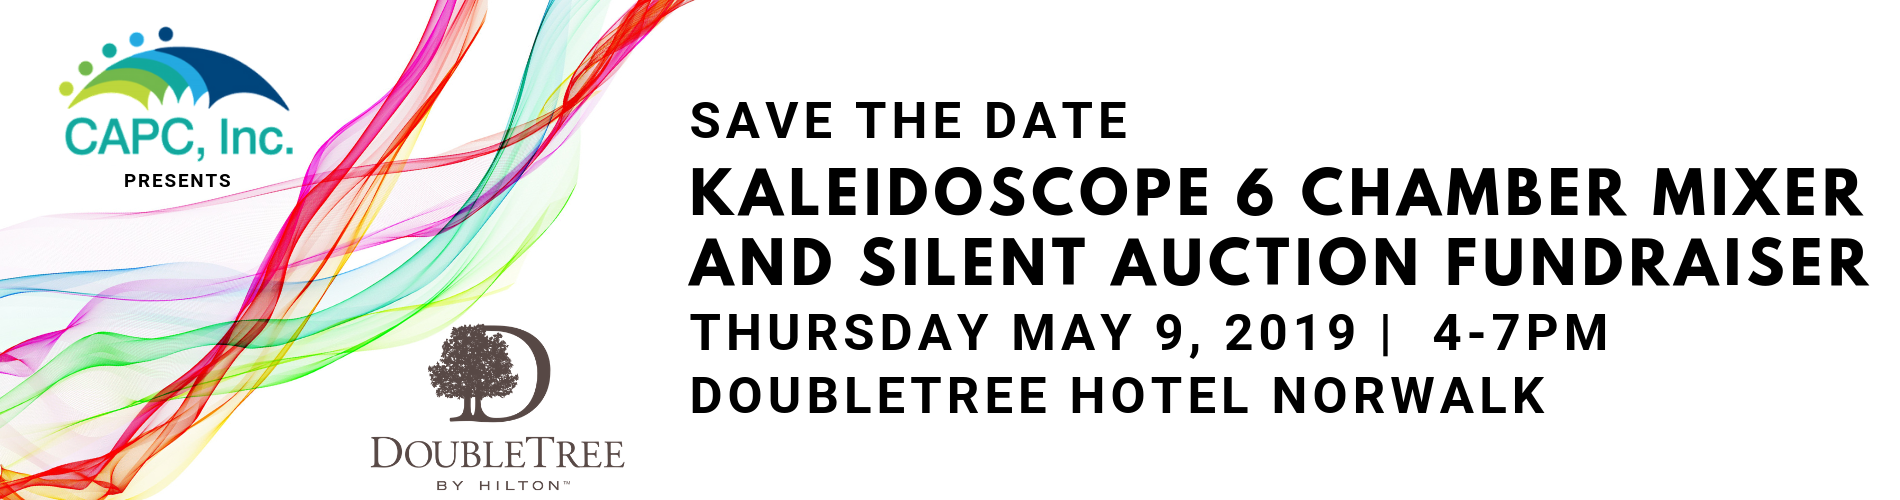 Kaleidoscope 6 Chamber Mixer and Silent Auction Fundraiser